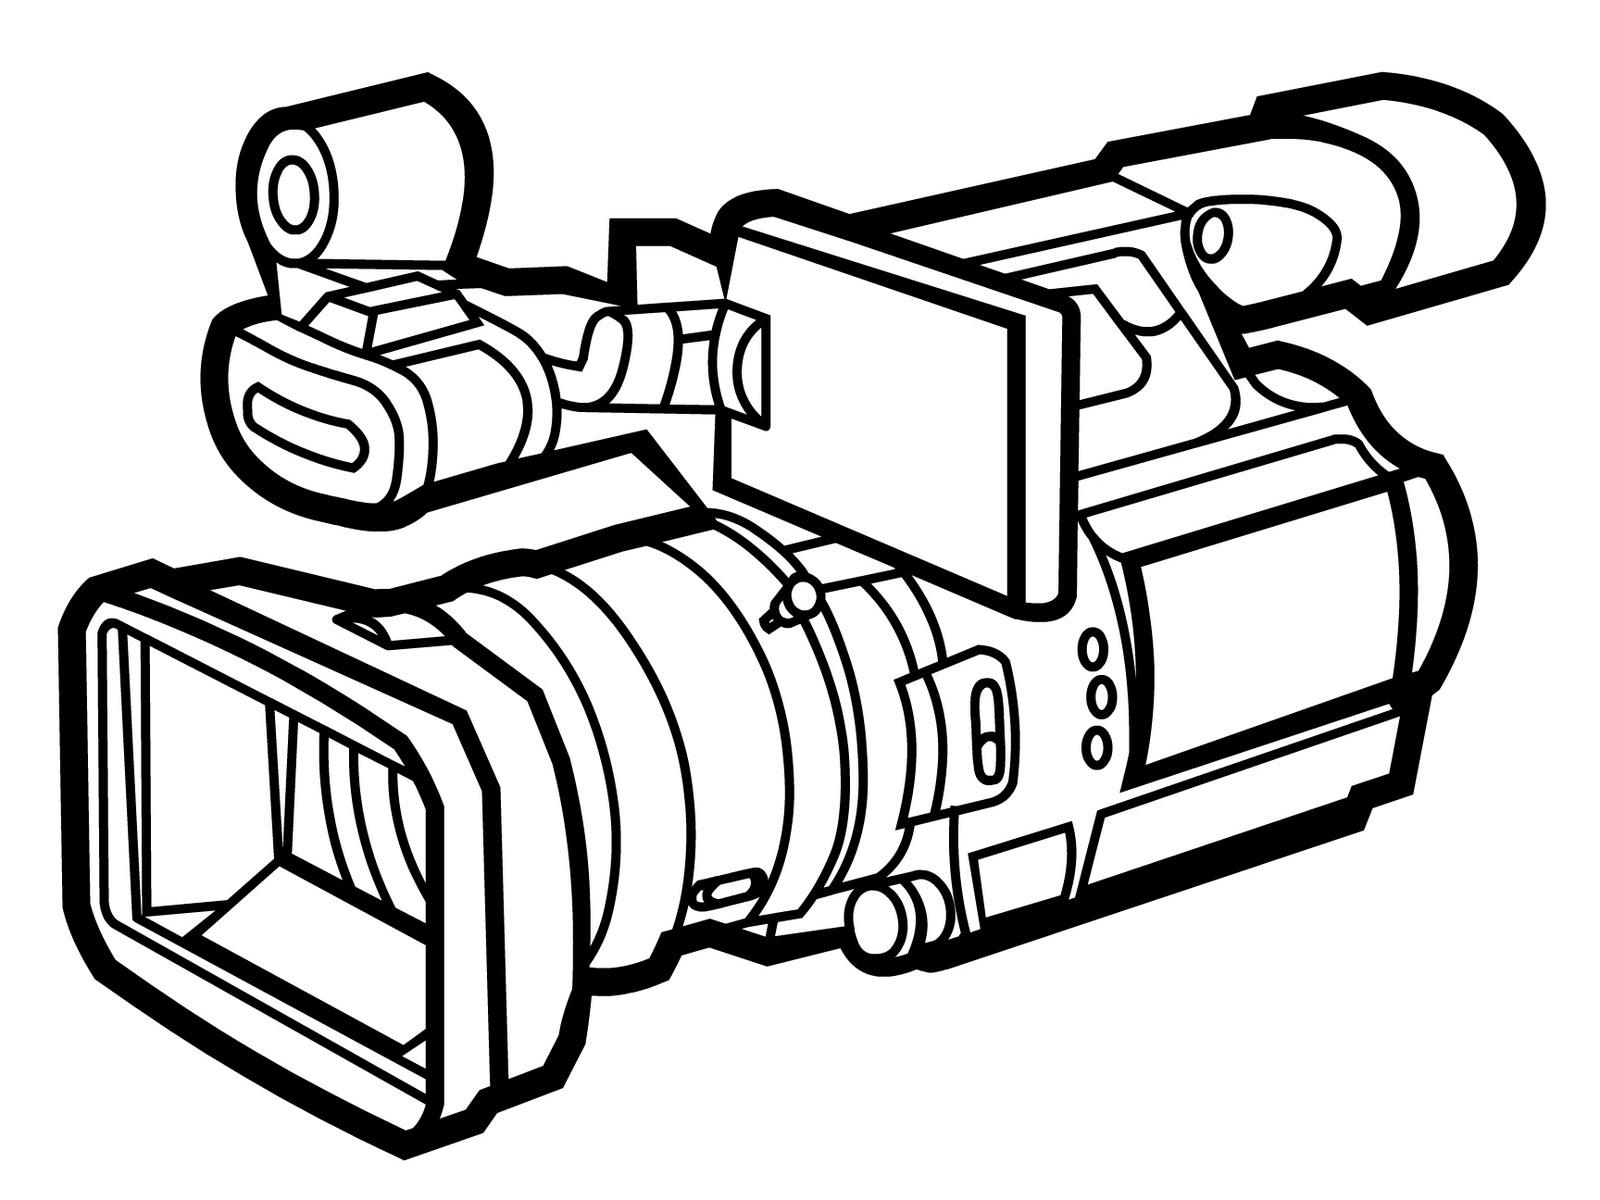 Video Surveillance Camera .-Video surveillance camera .-17